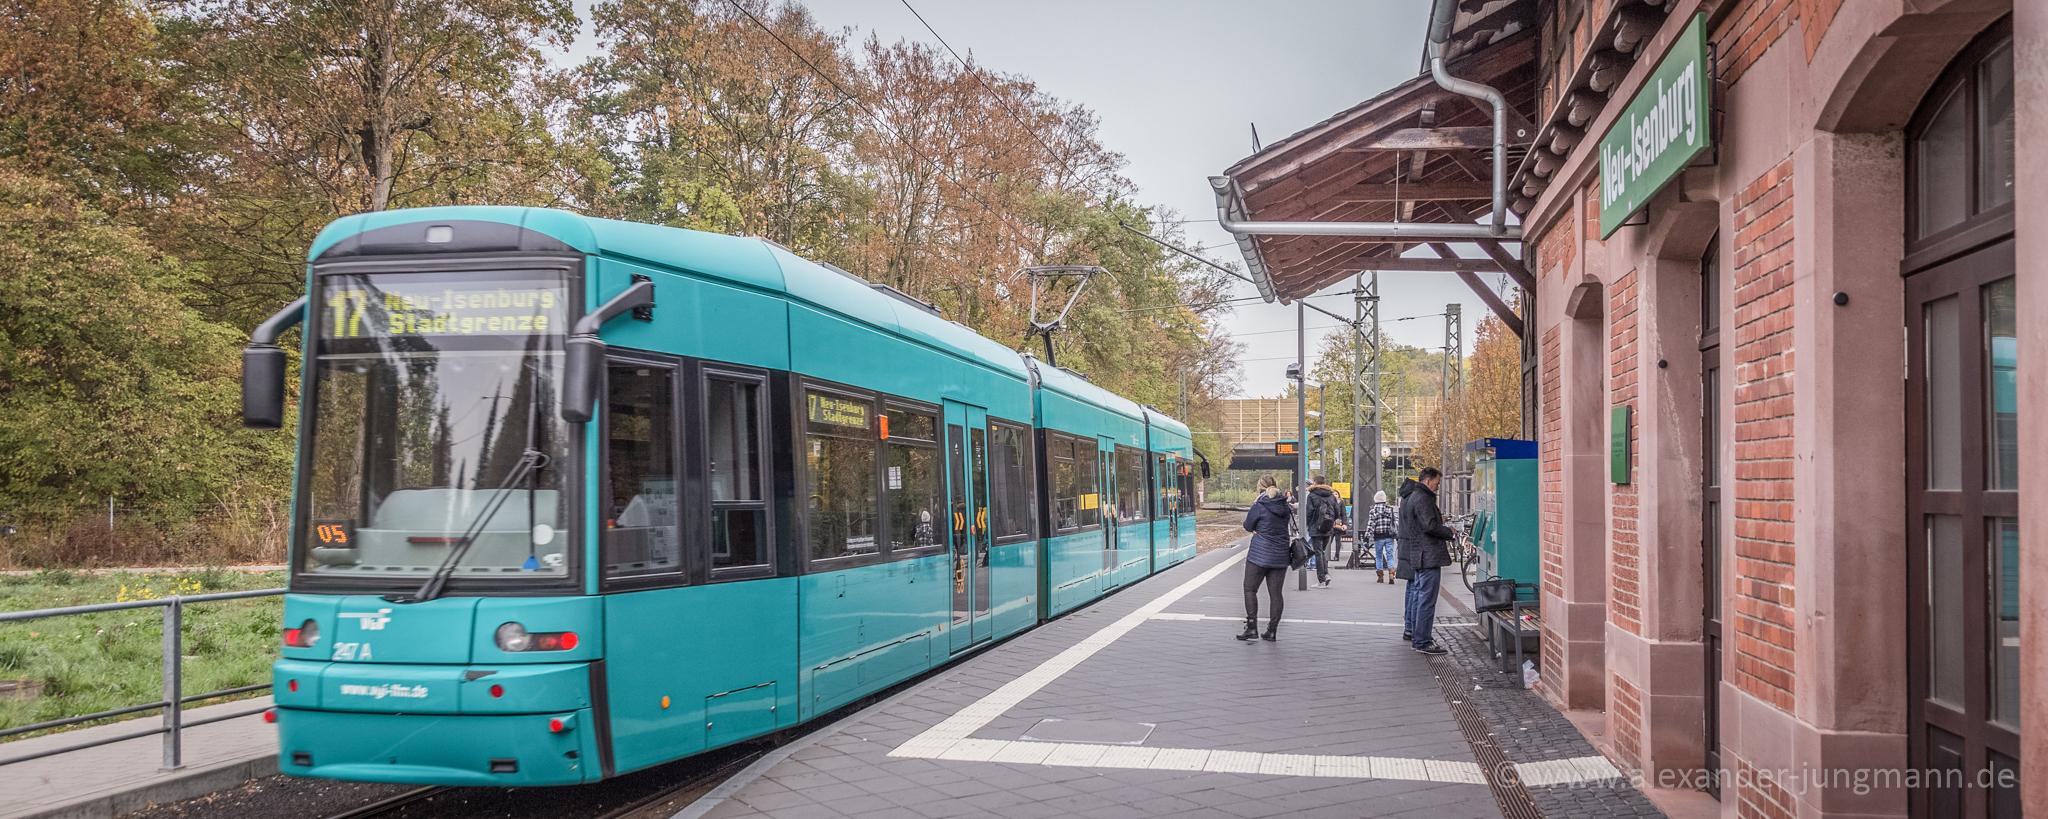 Straßenbahn an der Waldbahnstation